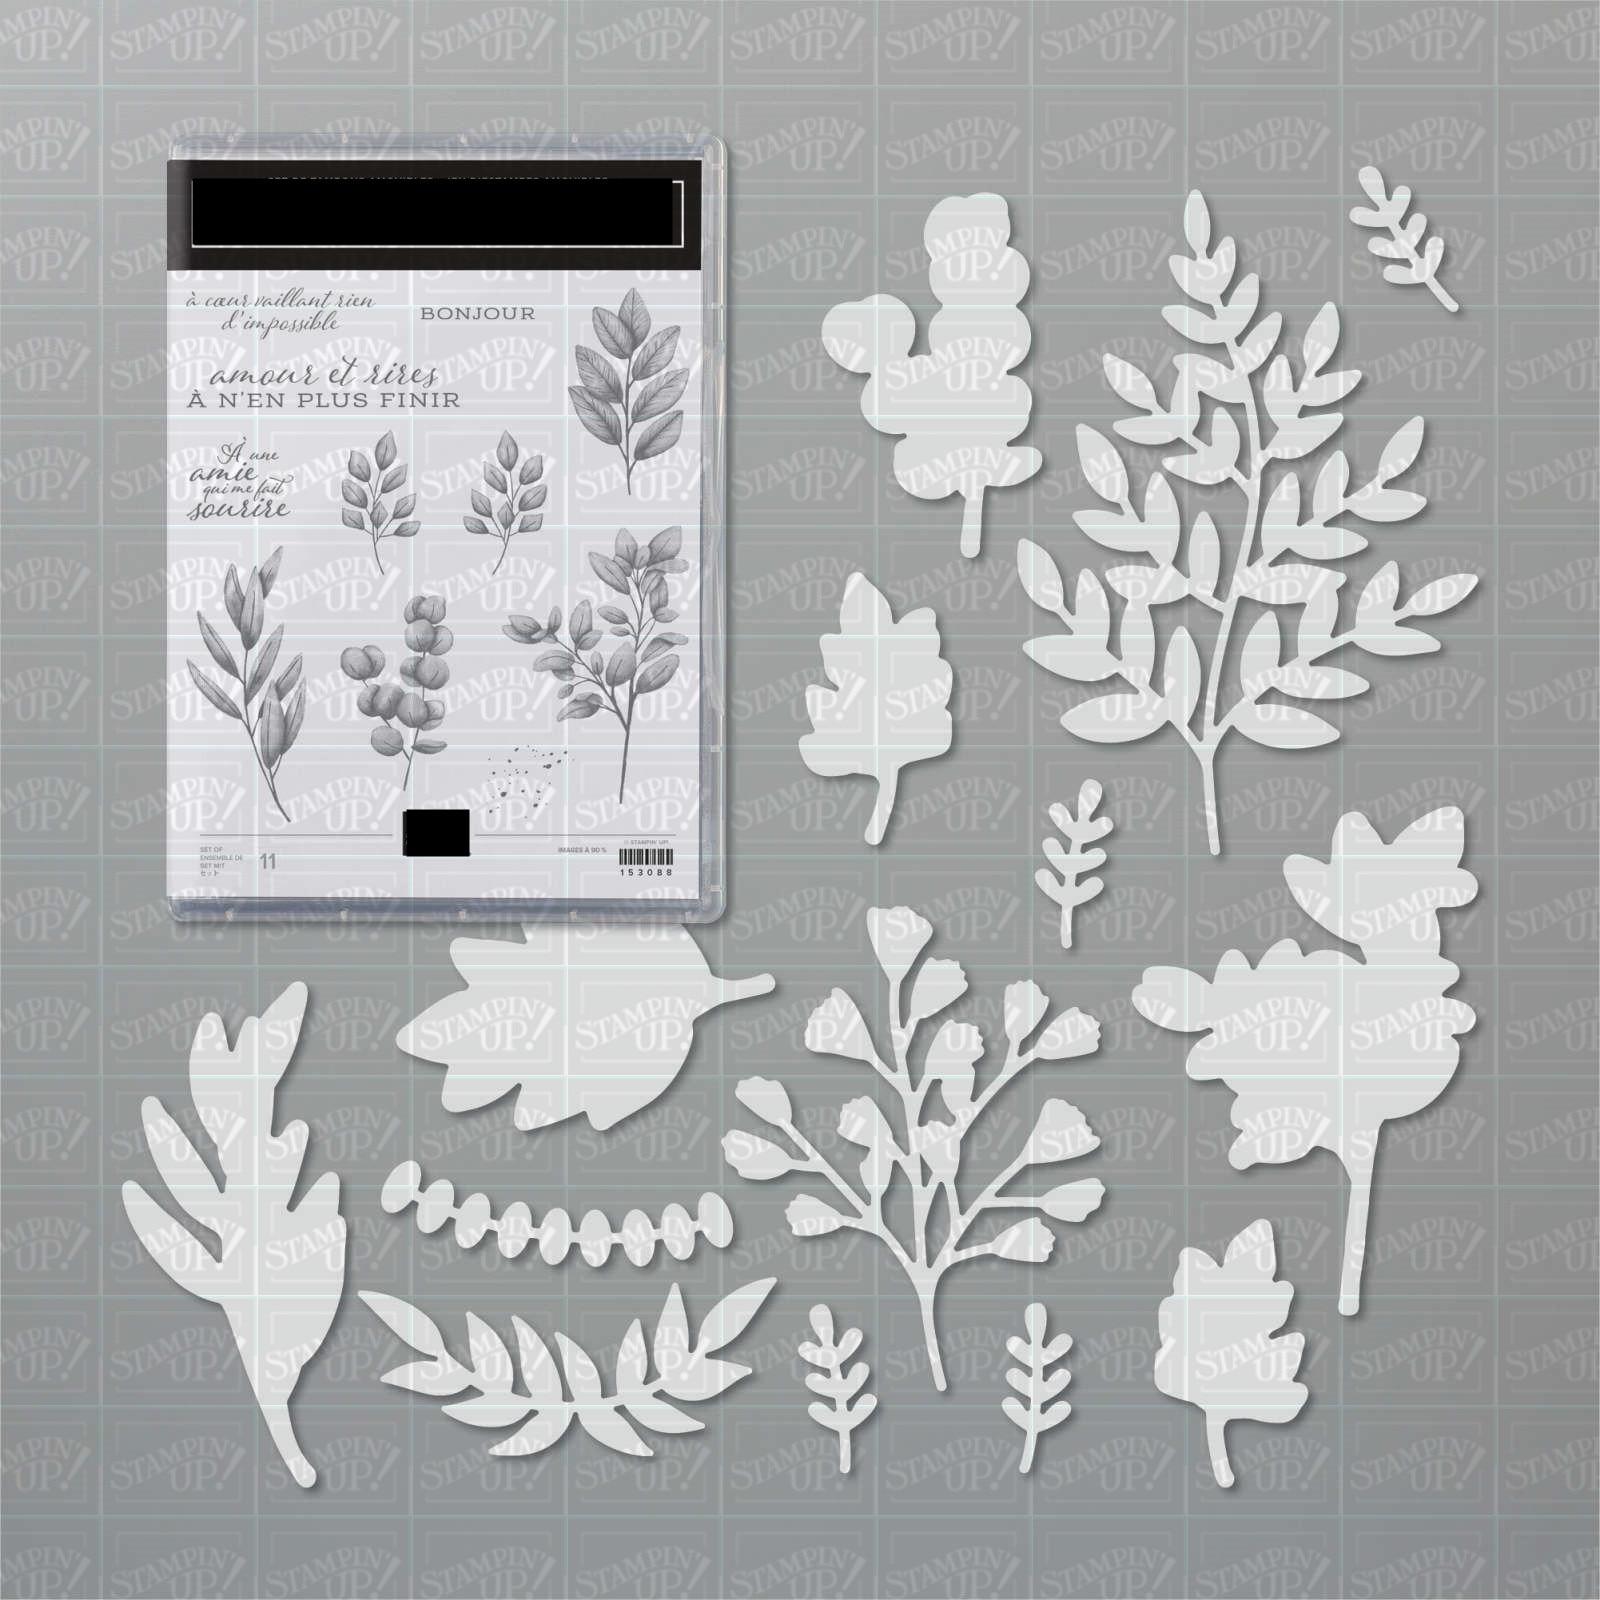 Green leaf Metal Cutting Dies Stencils for DIY Scrapbooking Decorative Embossing DIY Paper Craft Album template Dies  - buy with discount